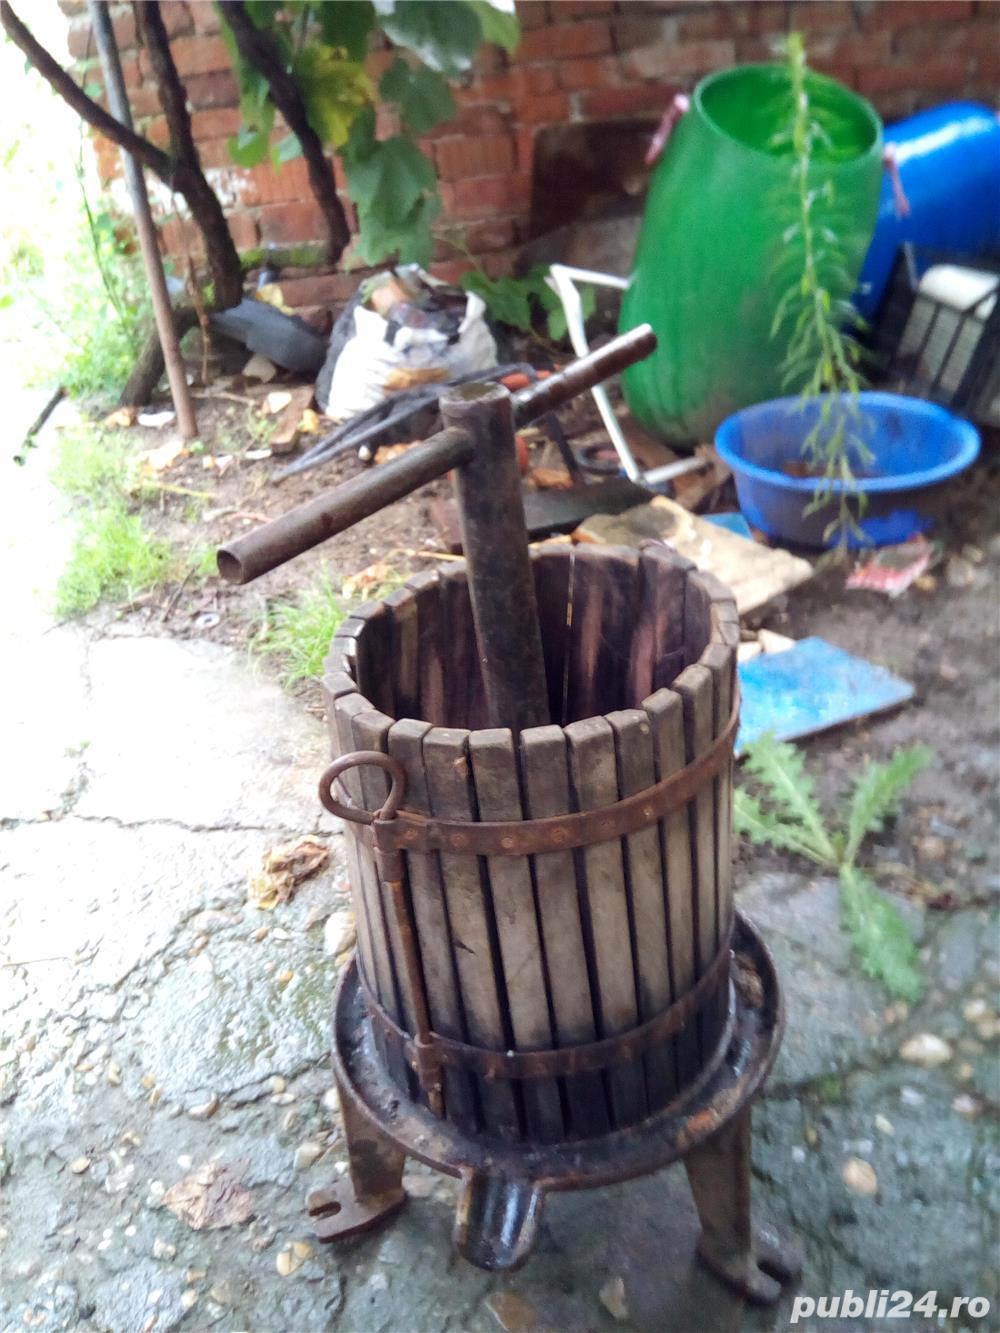 Vand press+:storcator la 500 ron